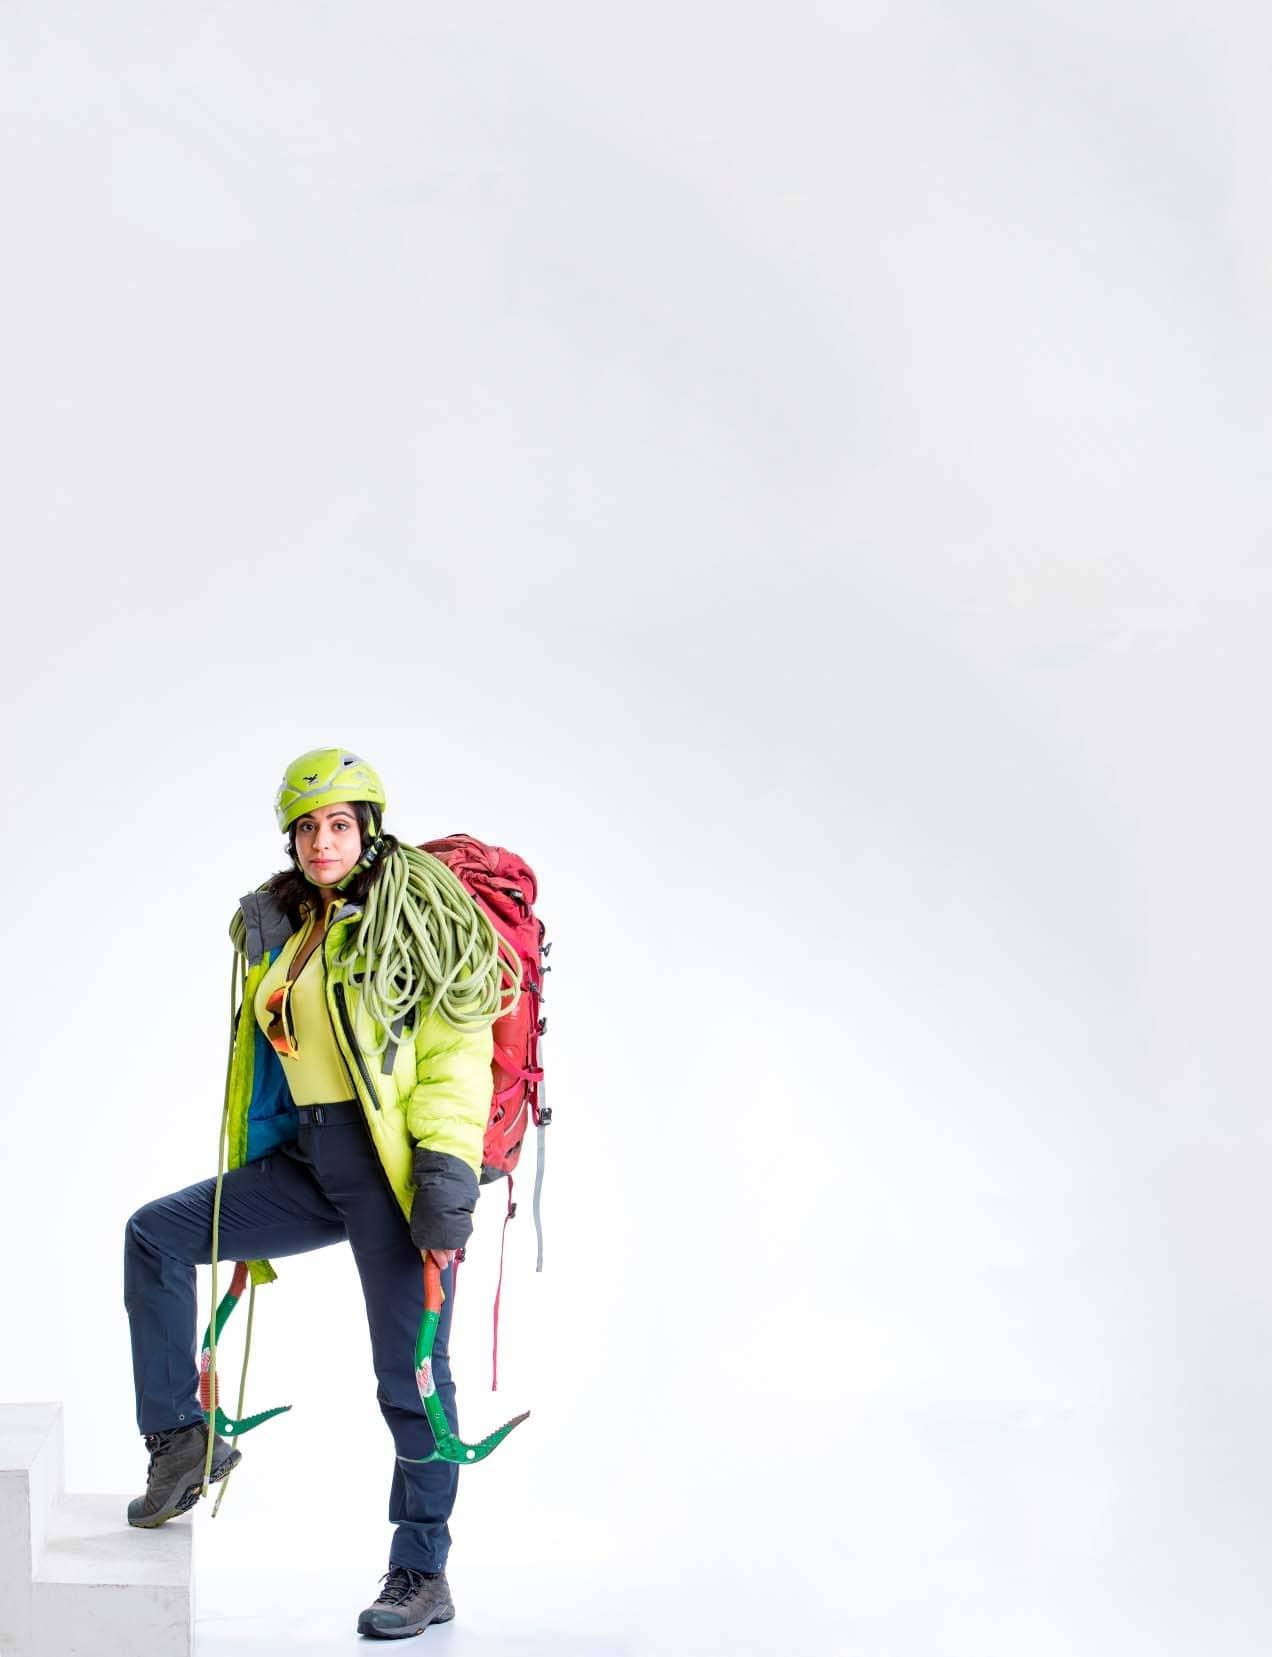 CLIMBING HIGH - Mountaineer Kamal Kaur Recounts Her Experiences